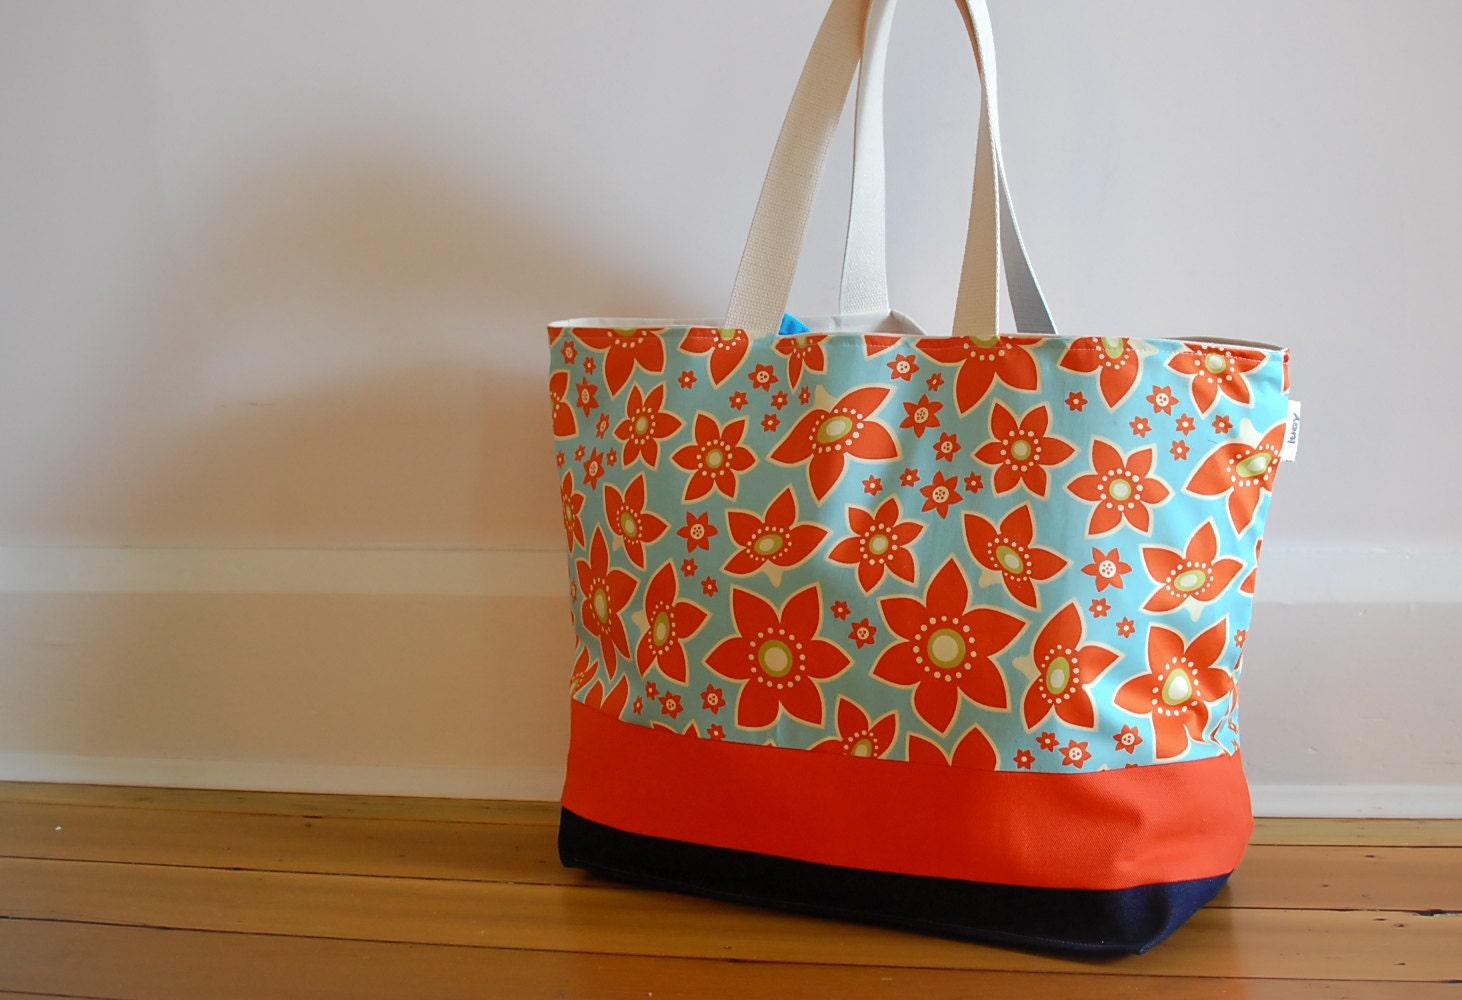 EXTRA Large Beach Bag // Tote In Orange And Aqua Flowers